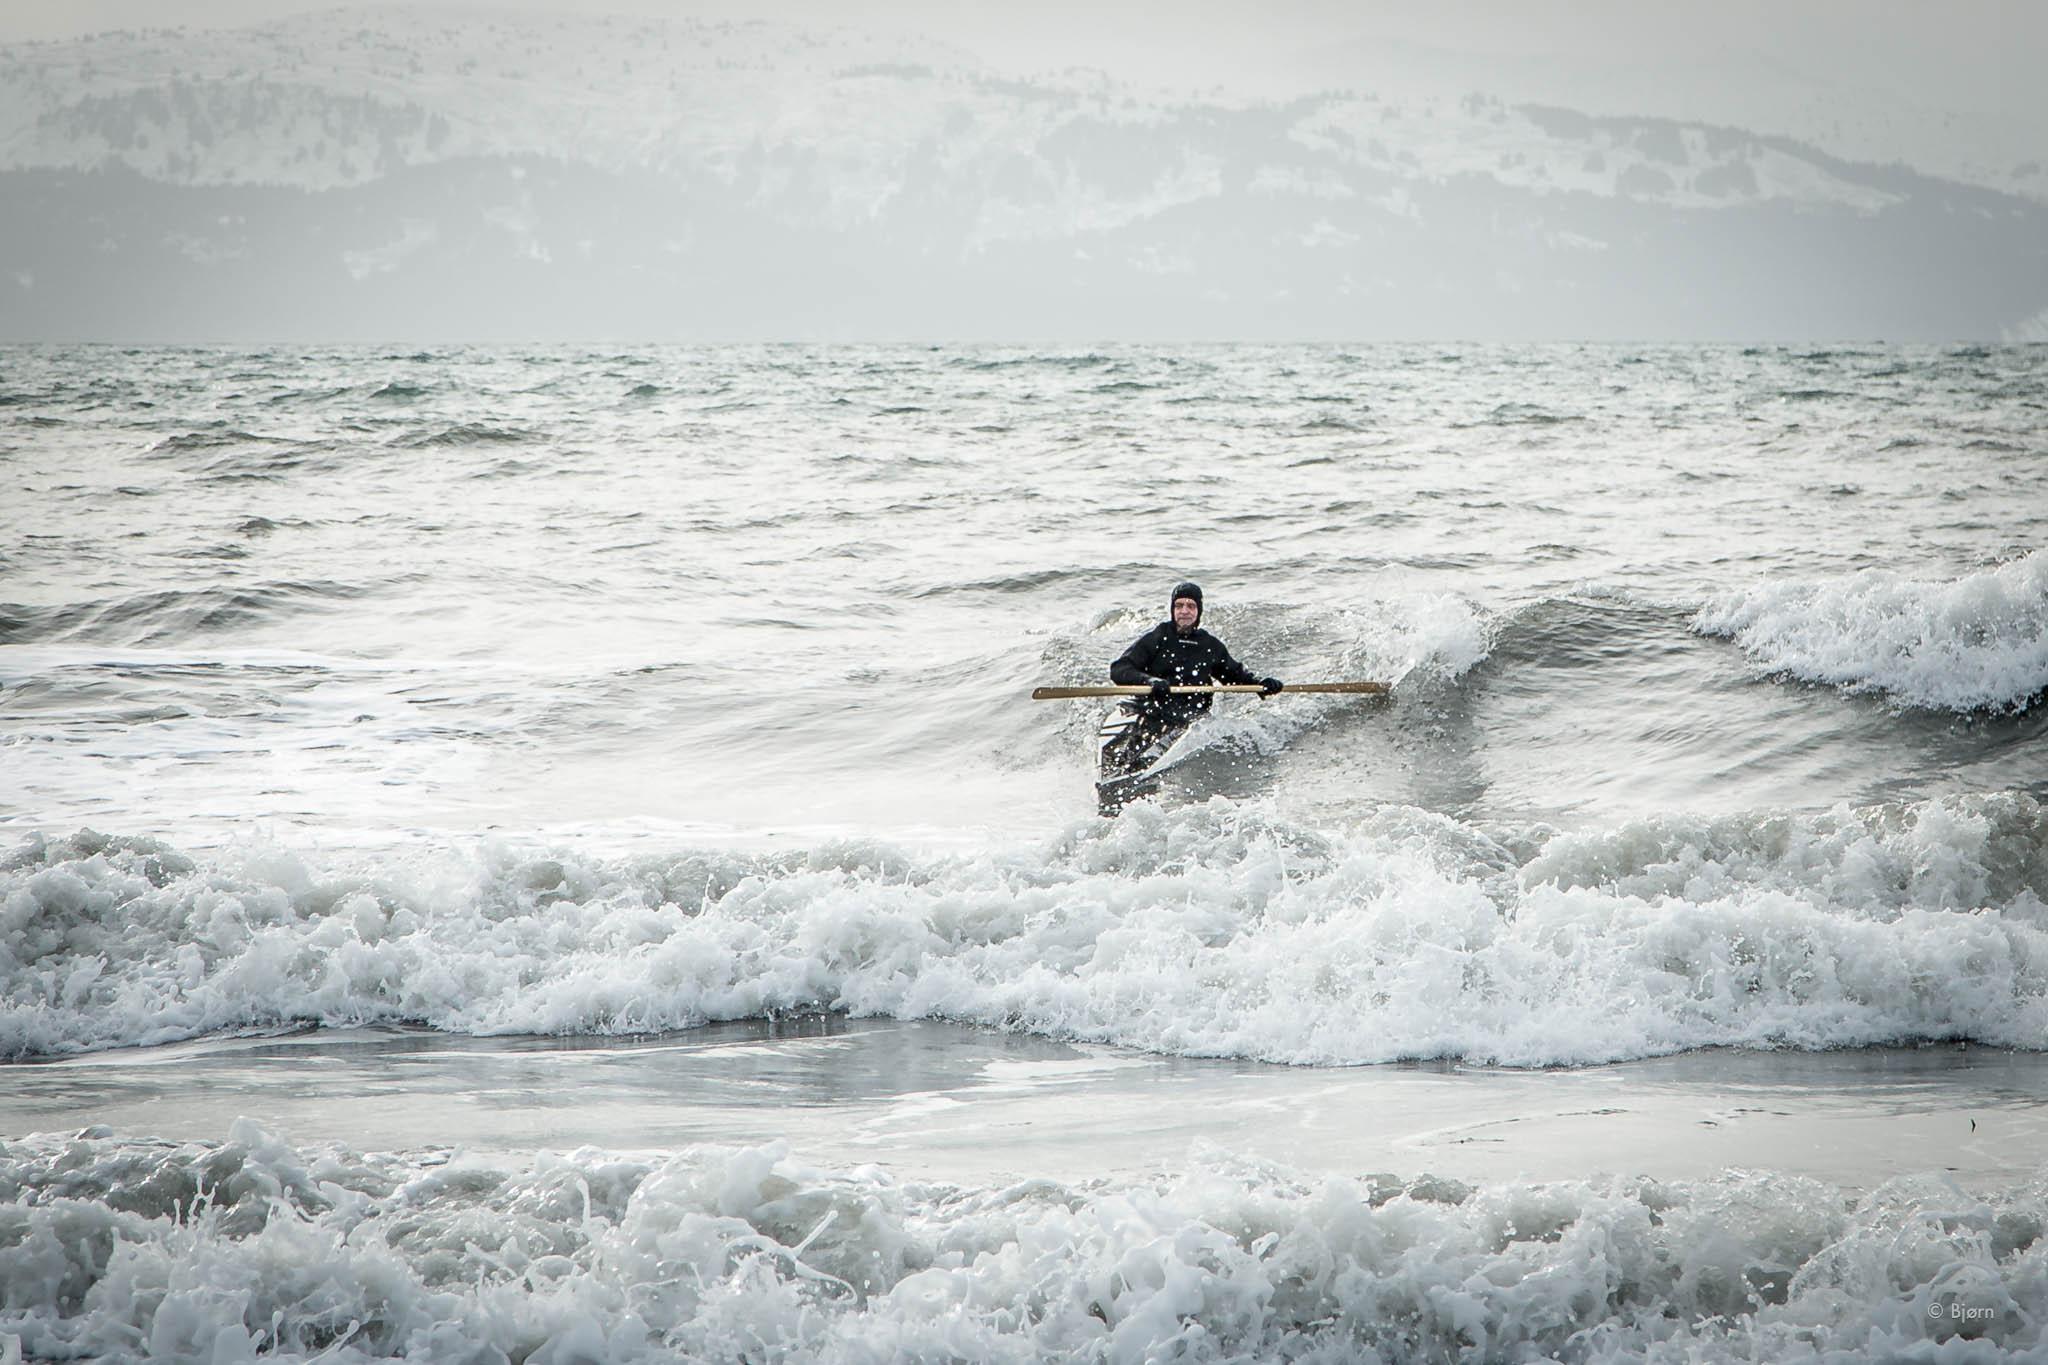 Bjørn surfing his traditional qayaq - Homer.